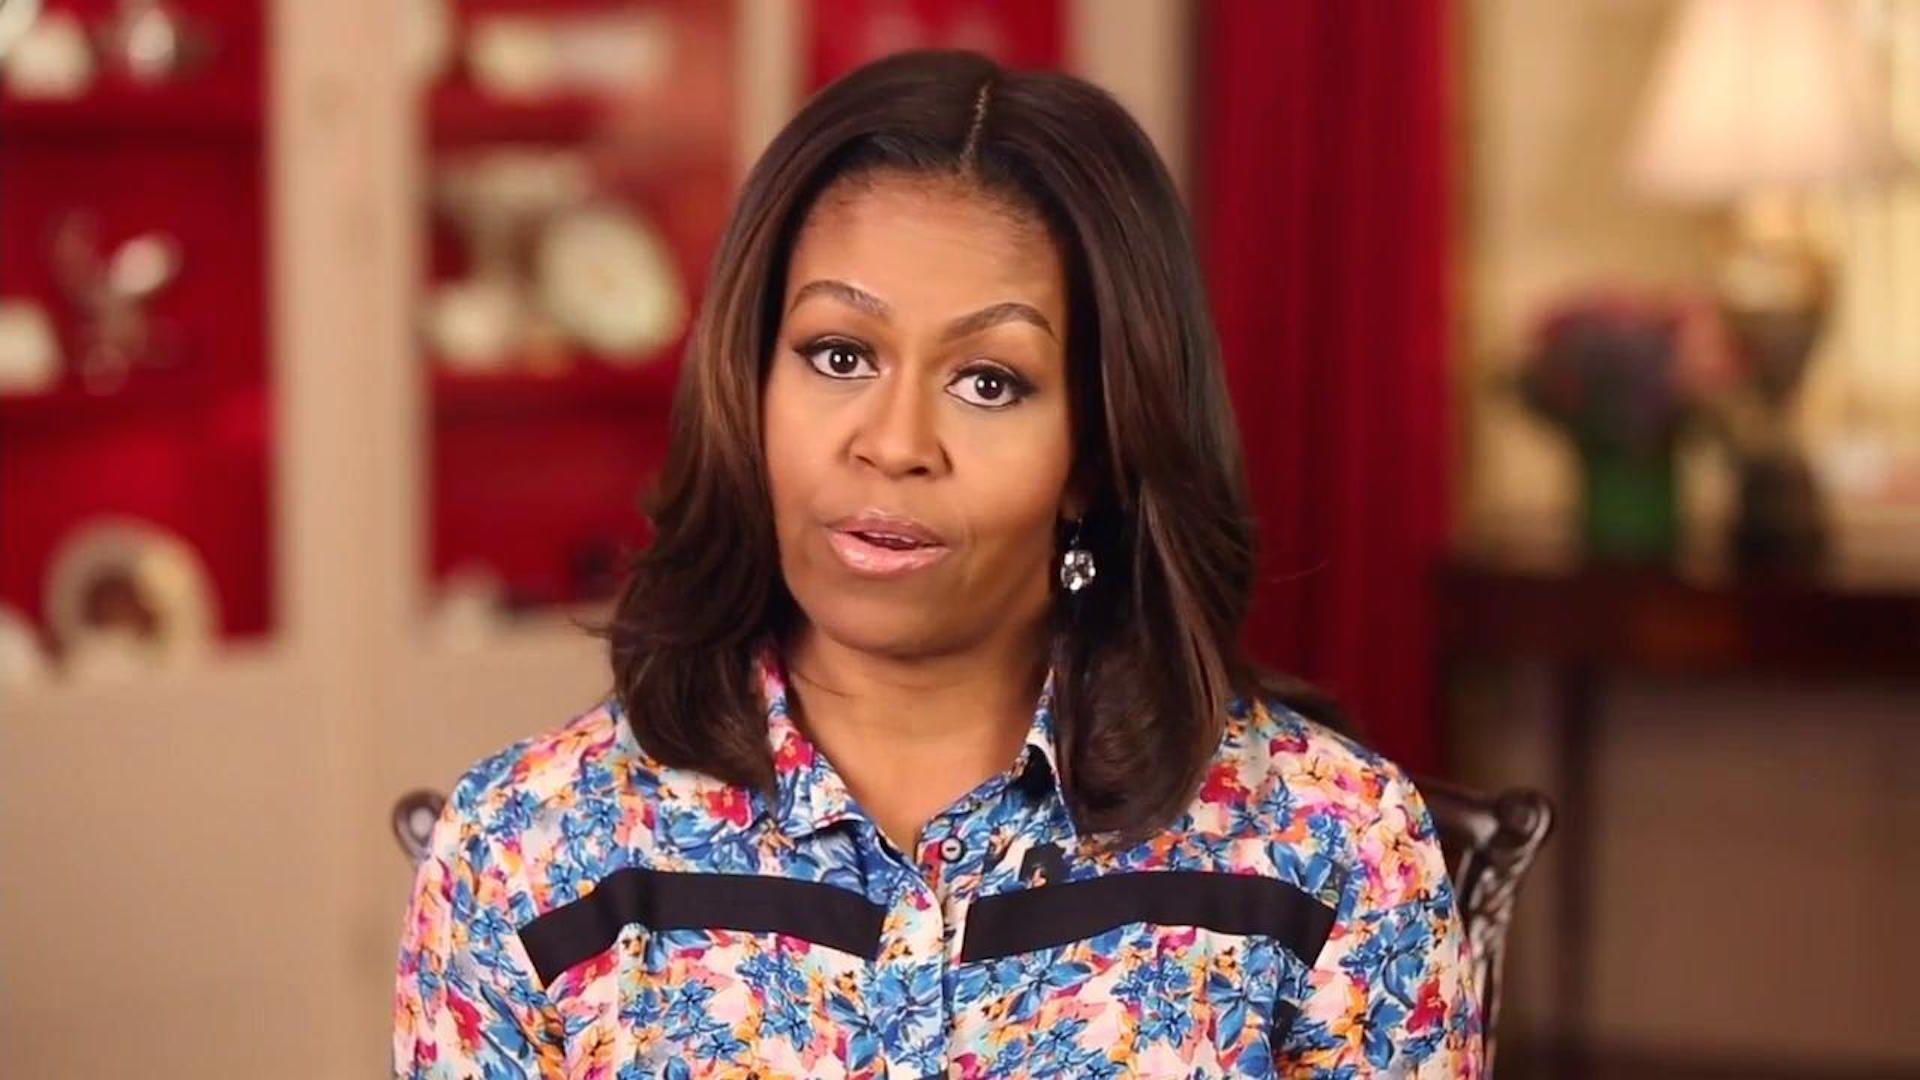 michelle obama honors missy elliott + queen latifah - video clip